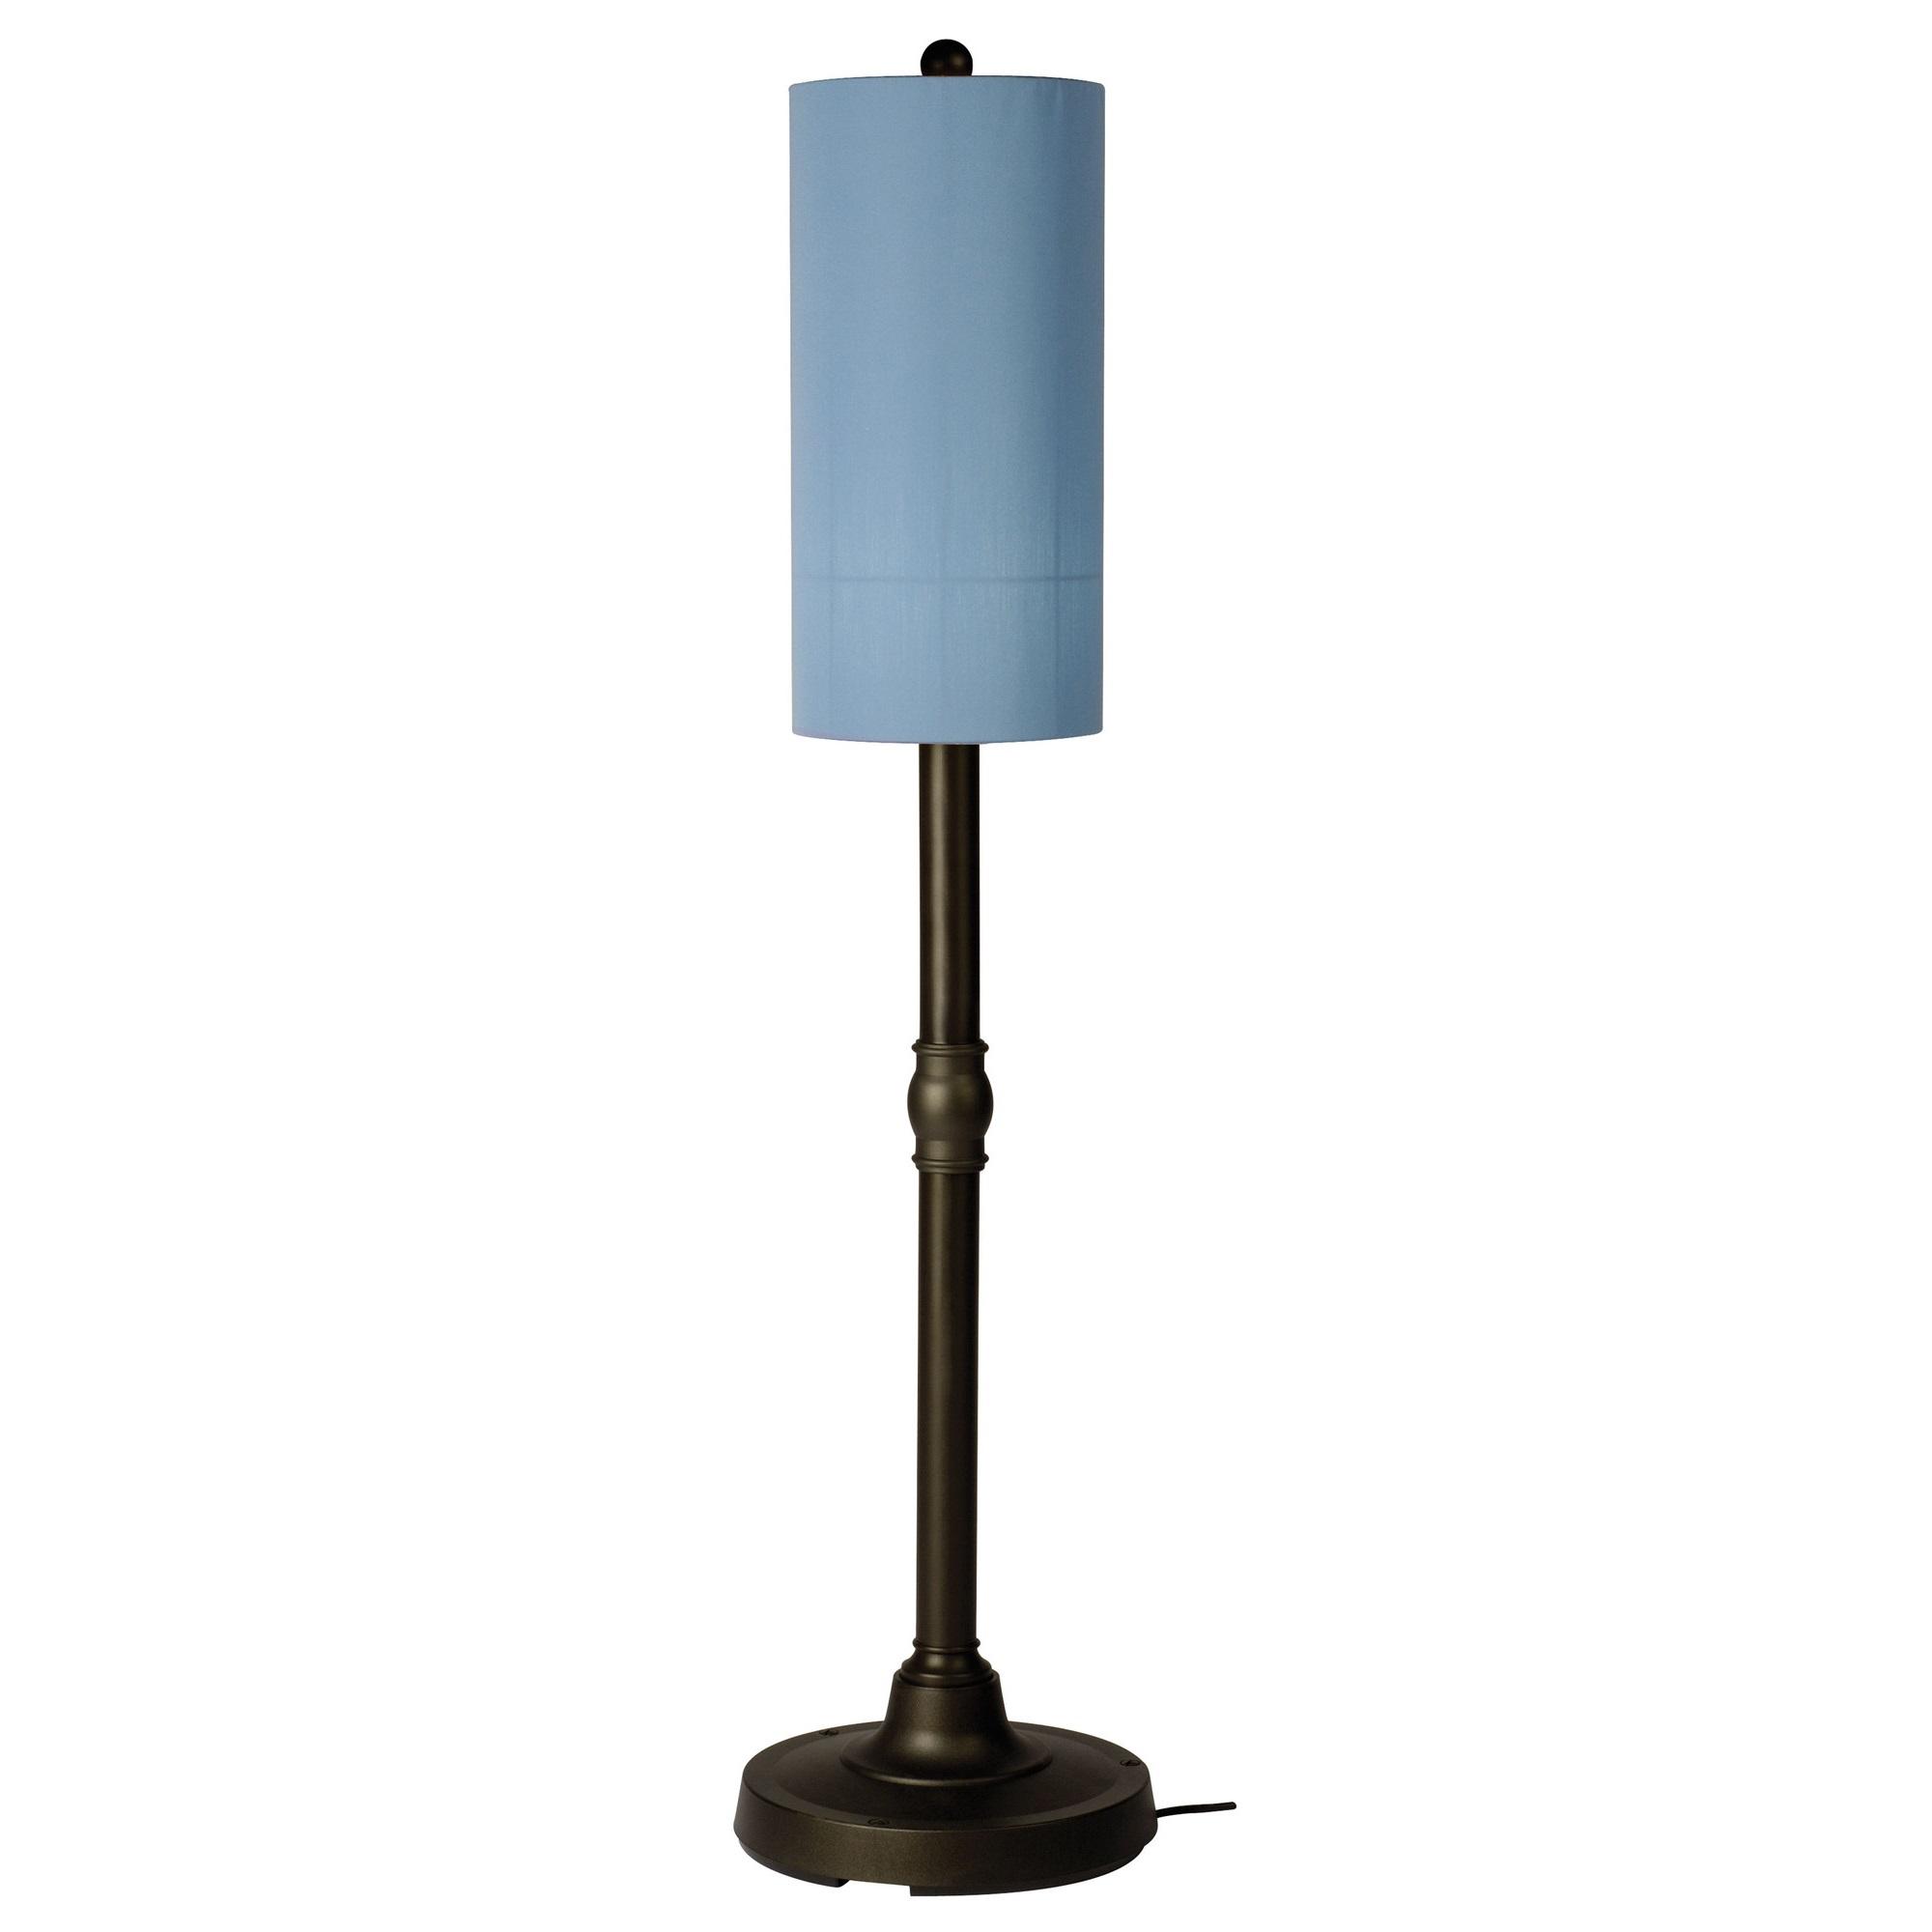 Patio living concepts coronado outdoor floor lamp in sky for Outdoor lighting concepts